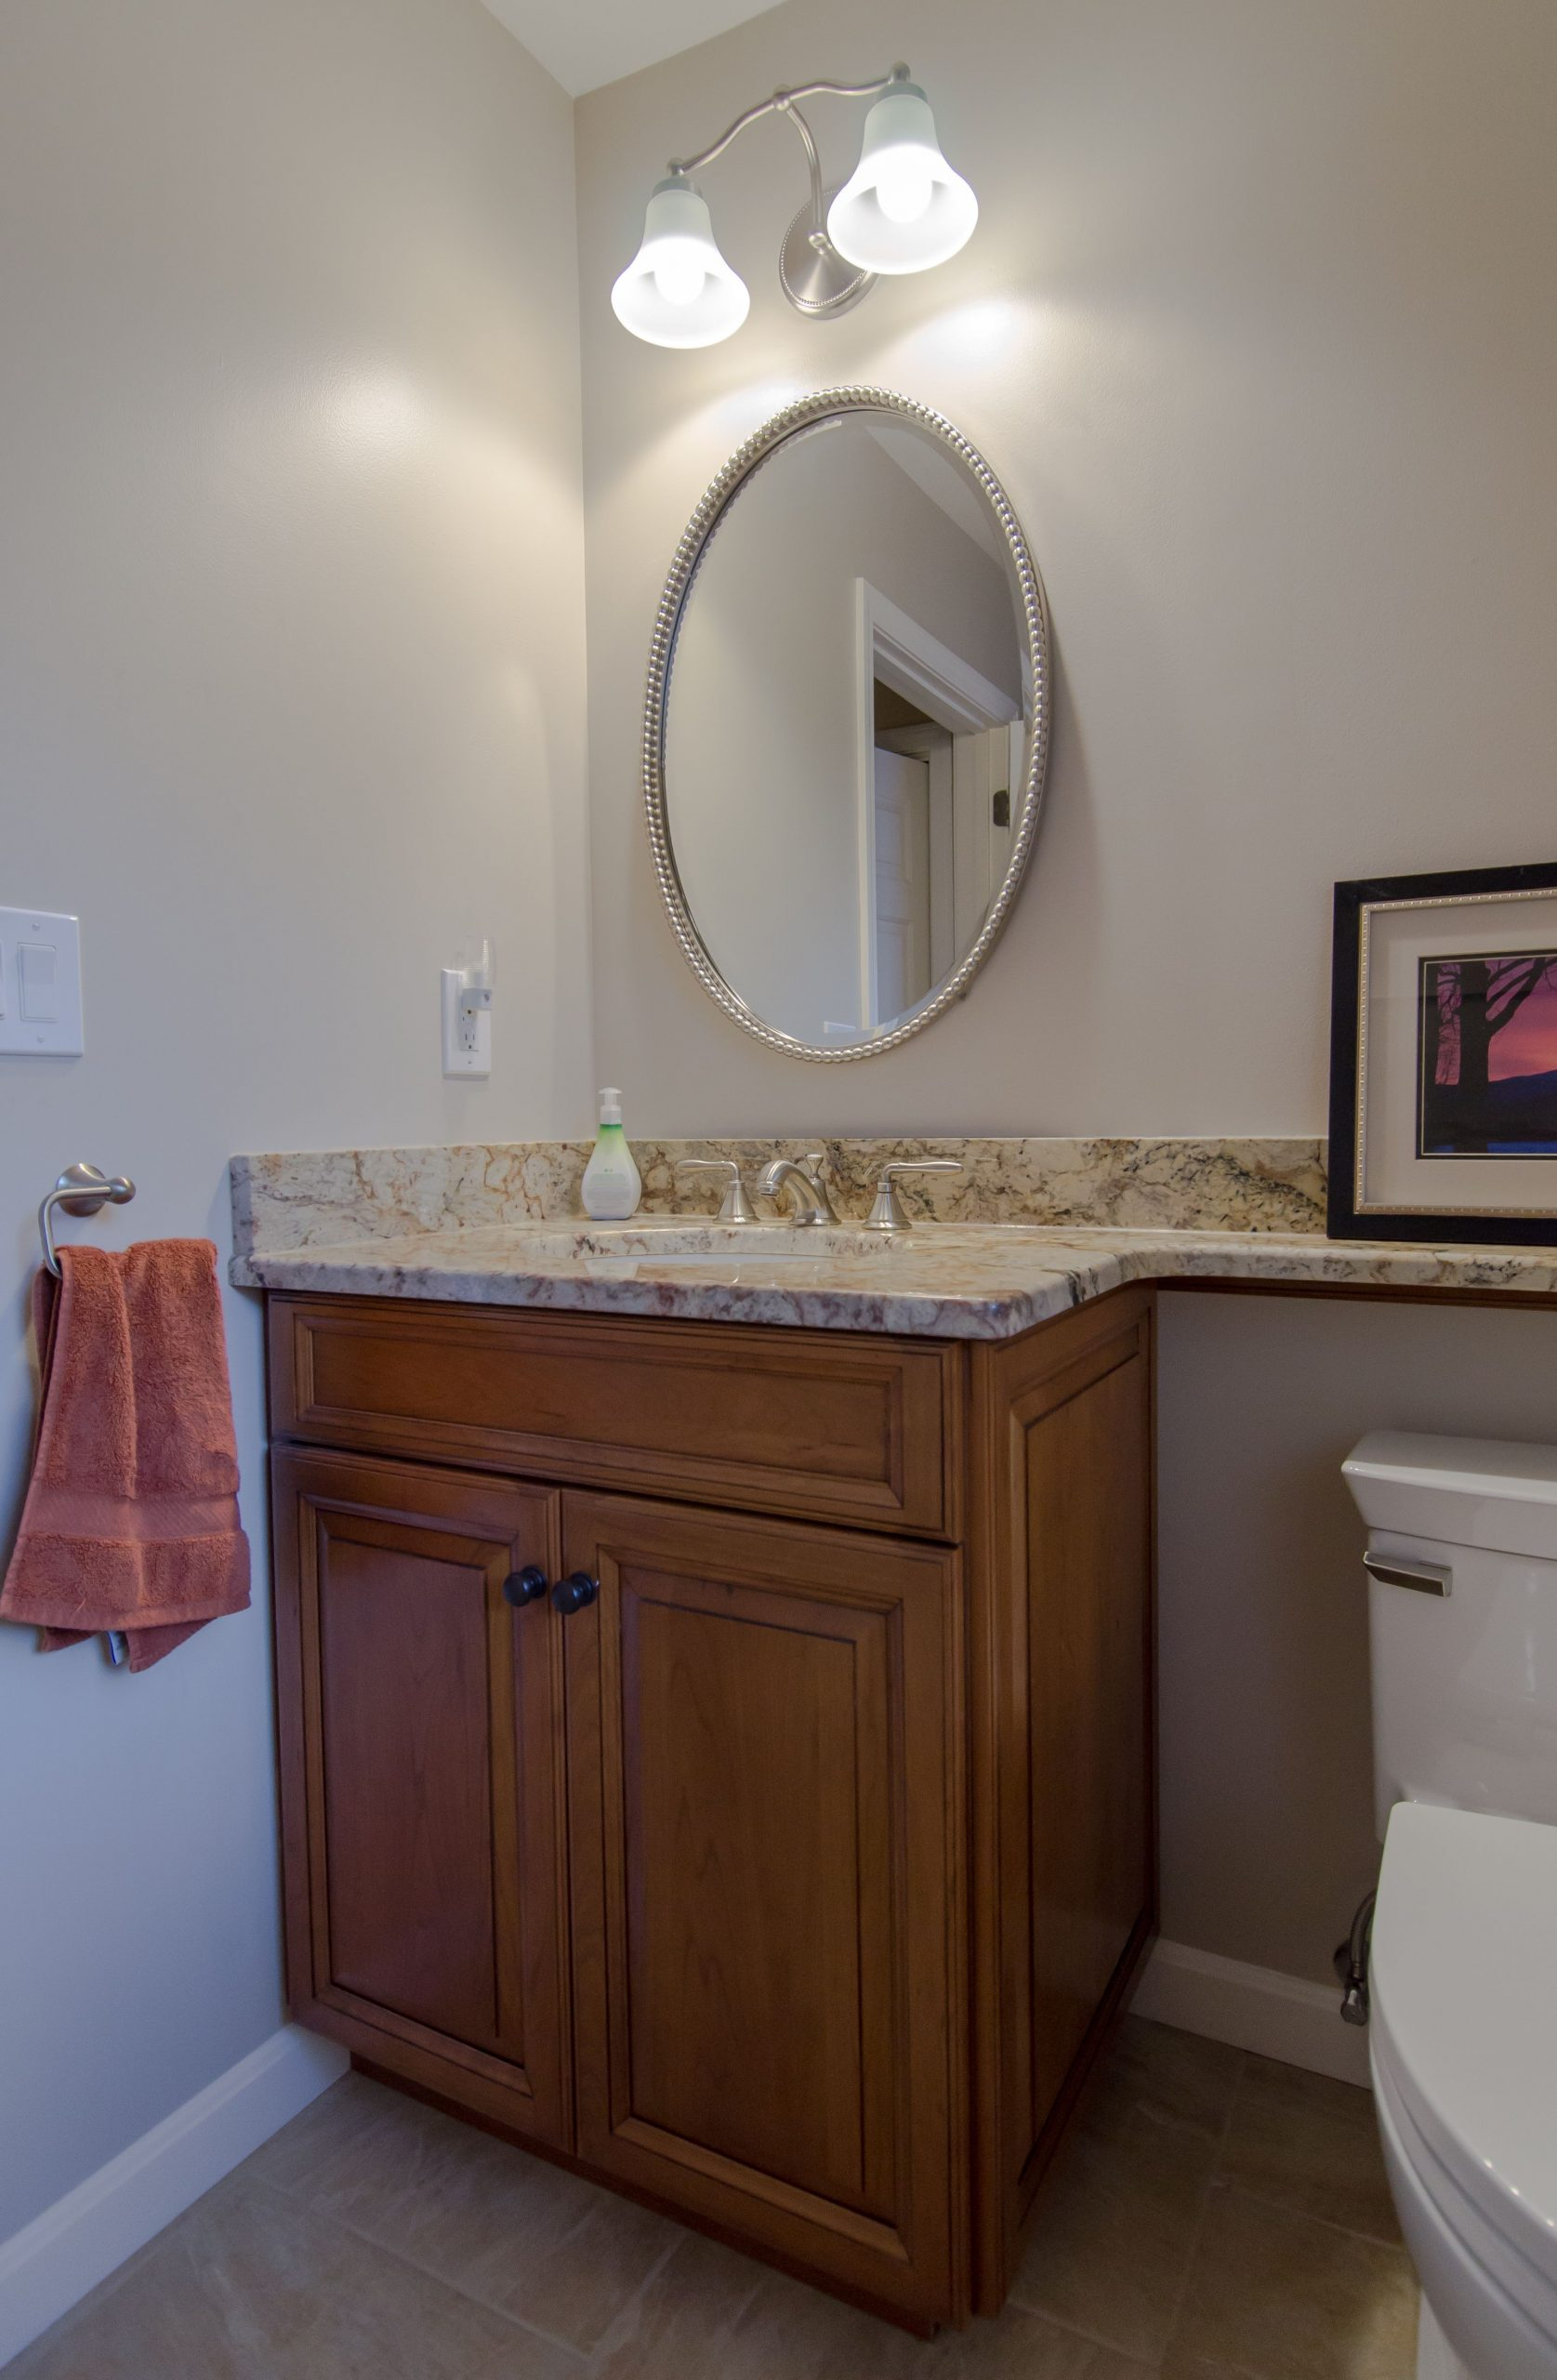 bathroom countertop overhang  Stained cherry cabinetry, granite countertop, bango ..